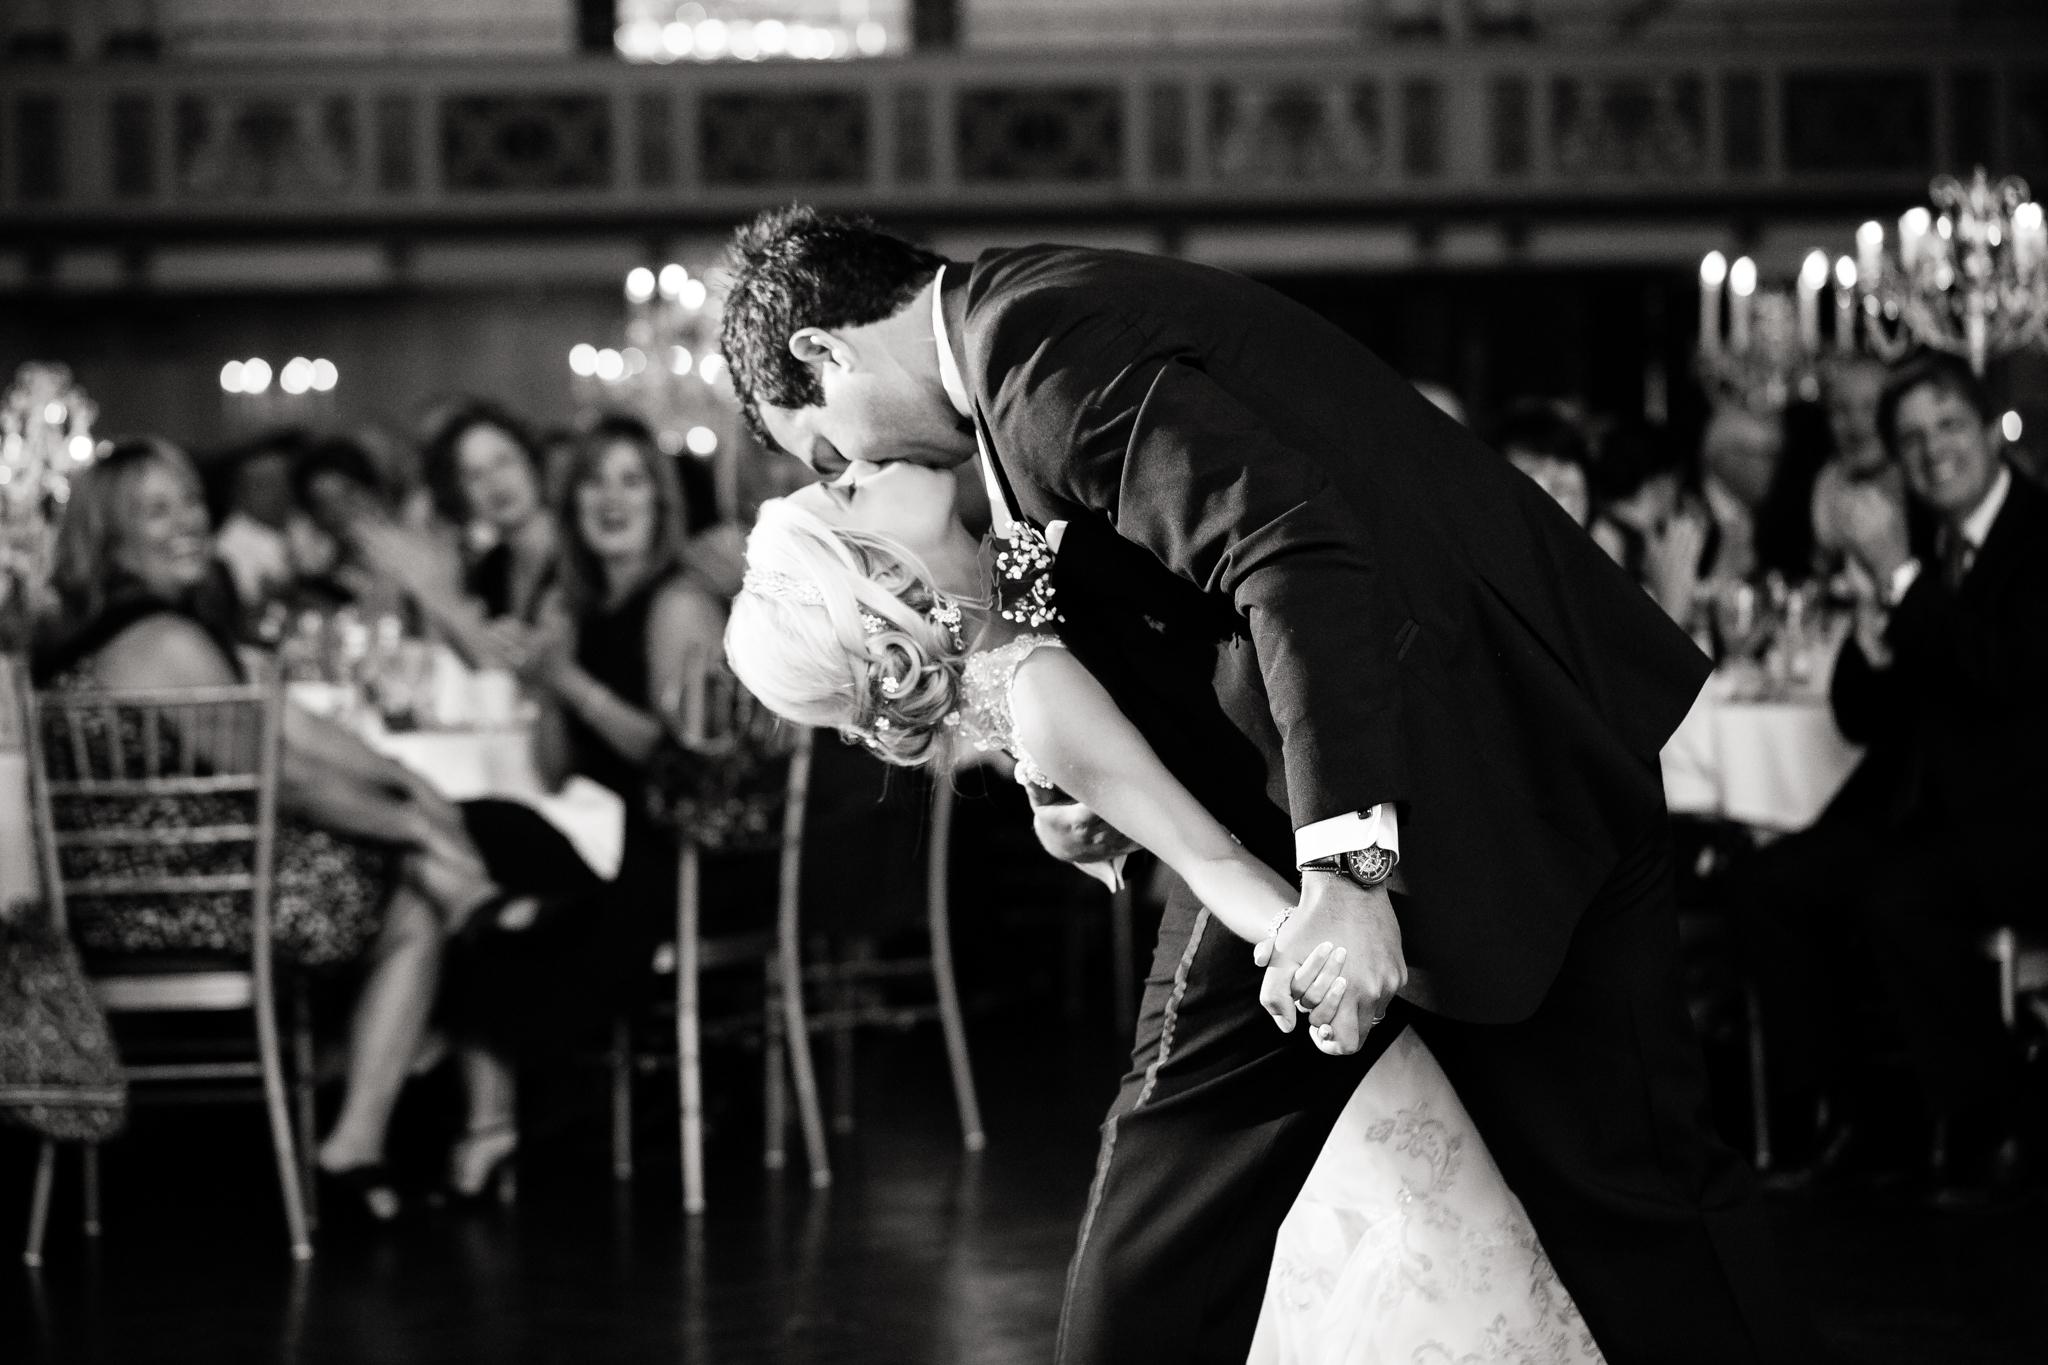 Statler-City-Buffalo-wedding-photographer- 0540bw.jpg